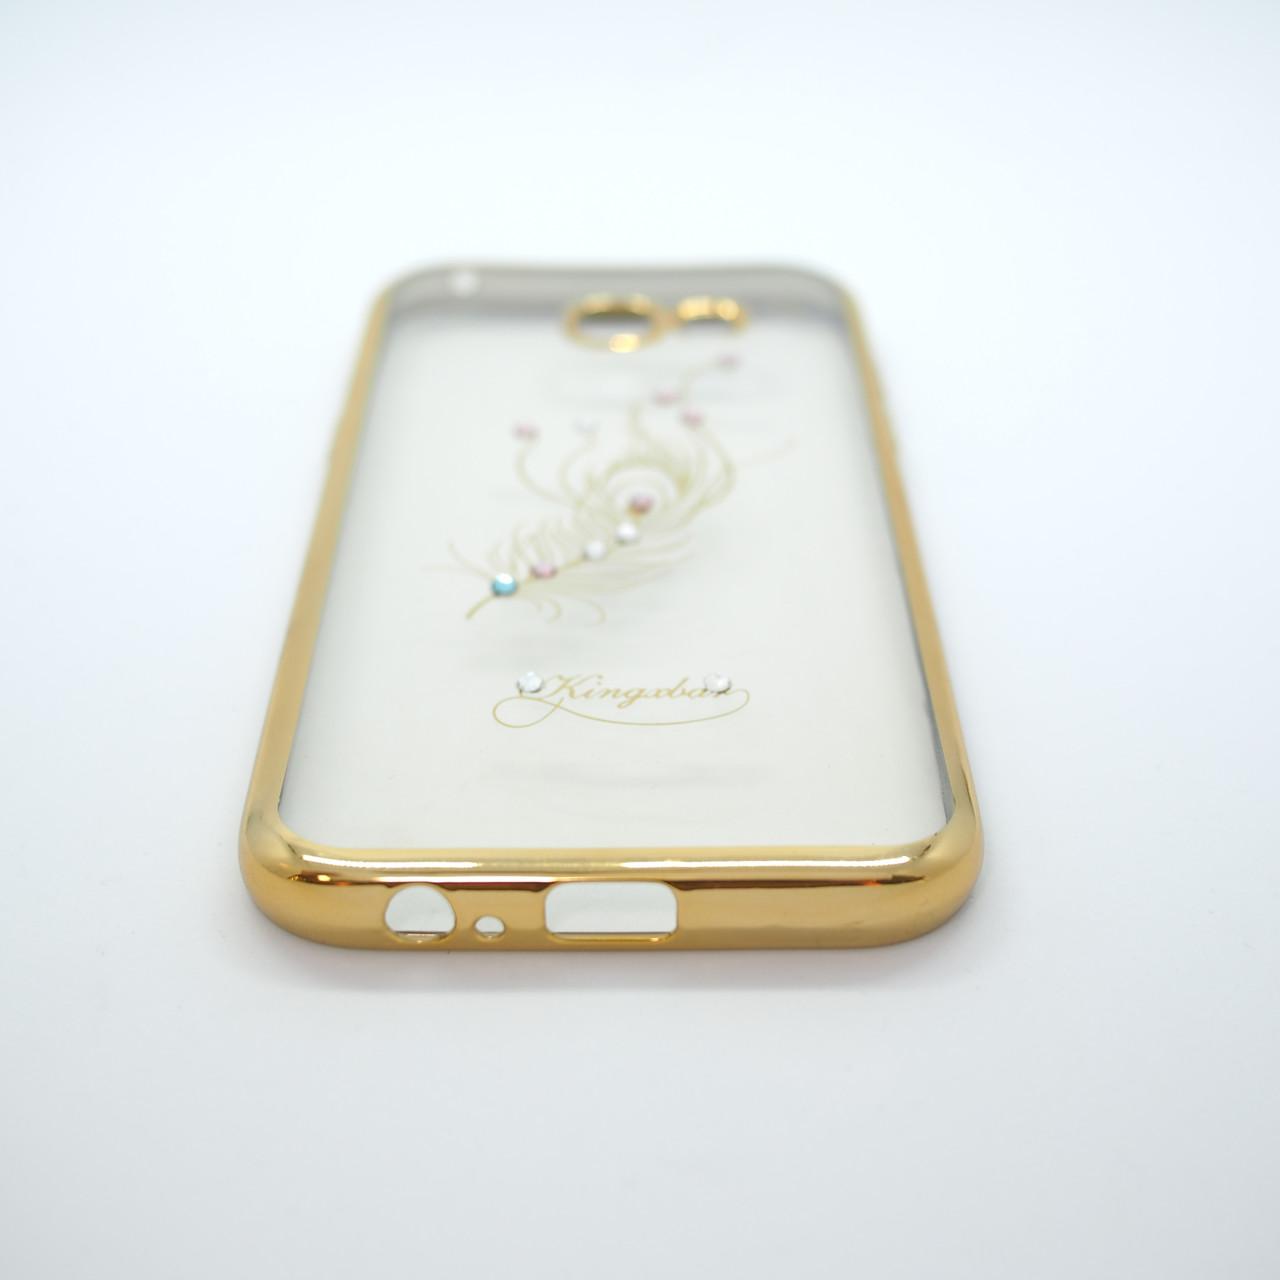 Чехлы для Galaxy A Series (остальные модели) Beckberg Breathe Samsung A520 A5 (A520) 2017